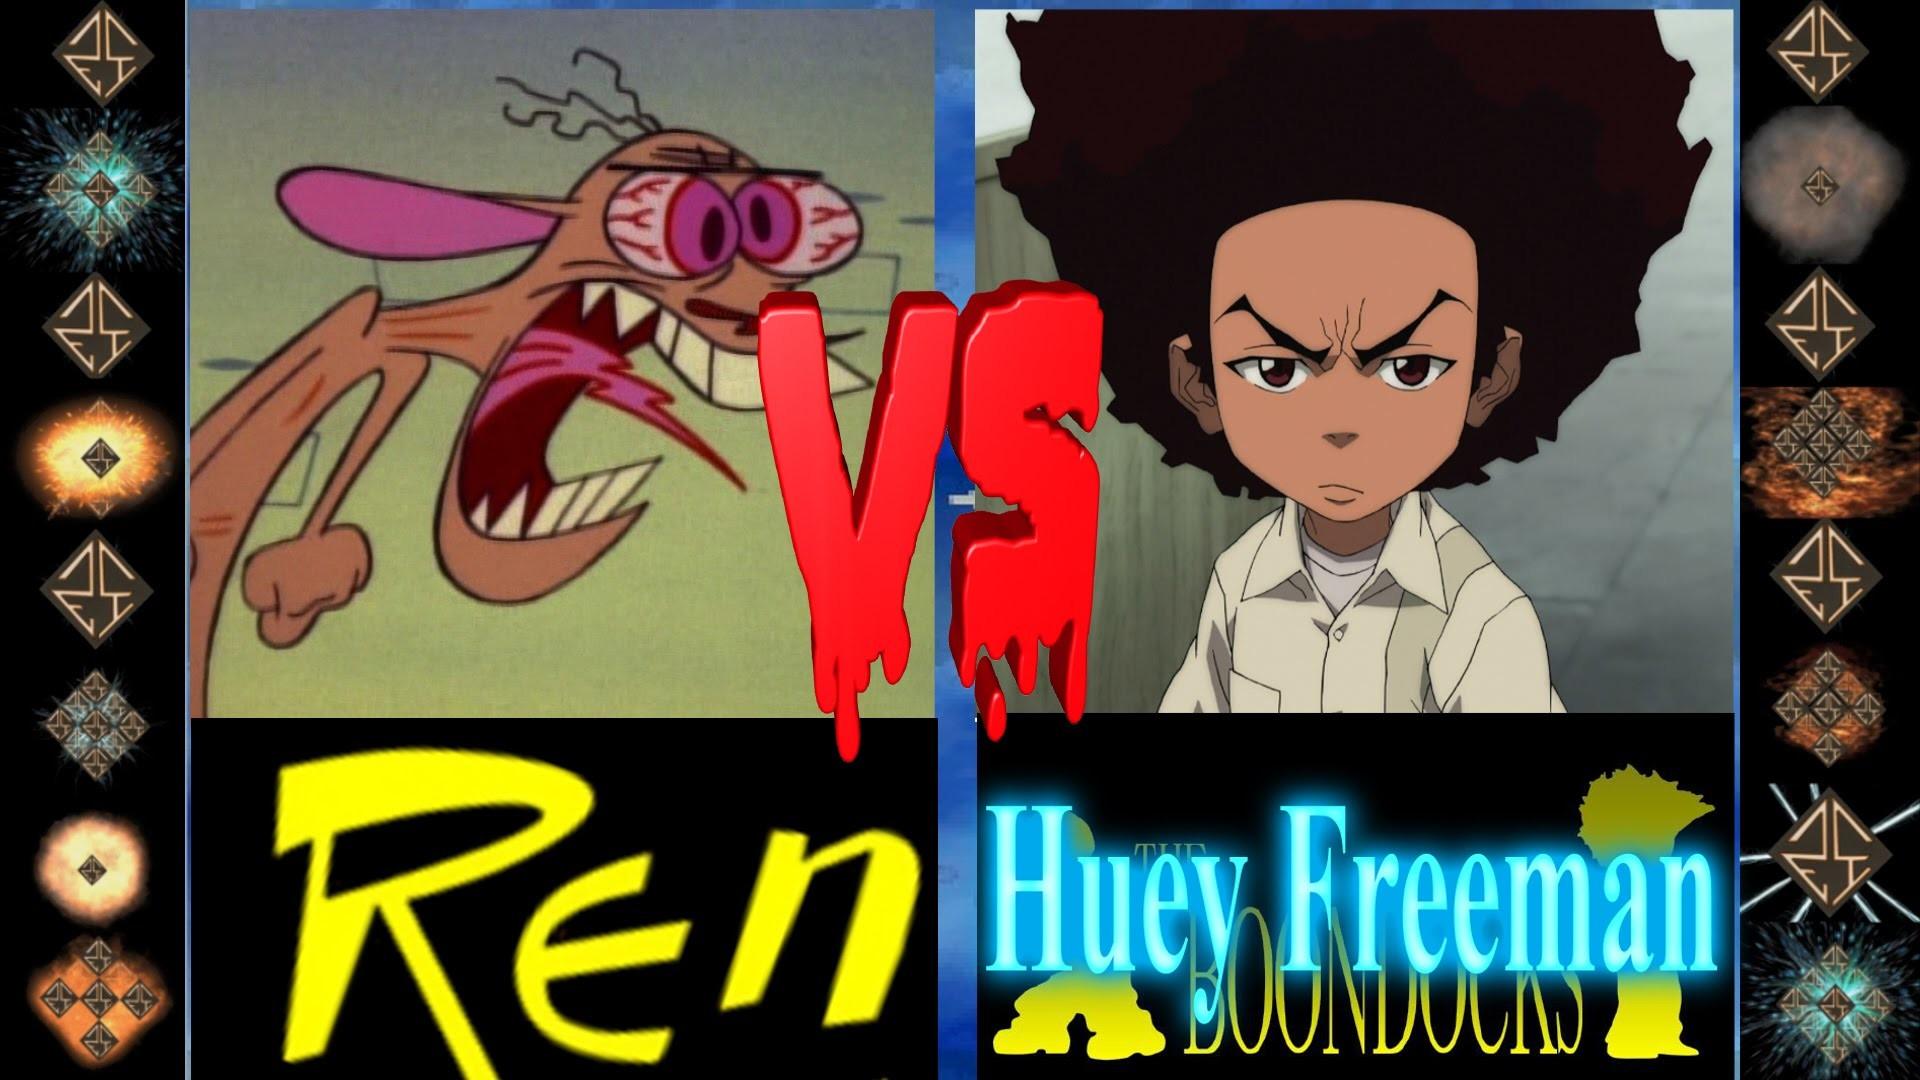 Ren (John Kricfalusi) vs Huey Freeman (The Boondocks) – Ultimate Mugen  Fight 2016